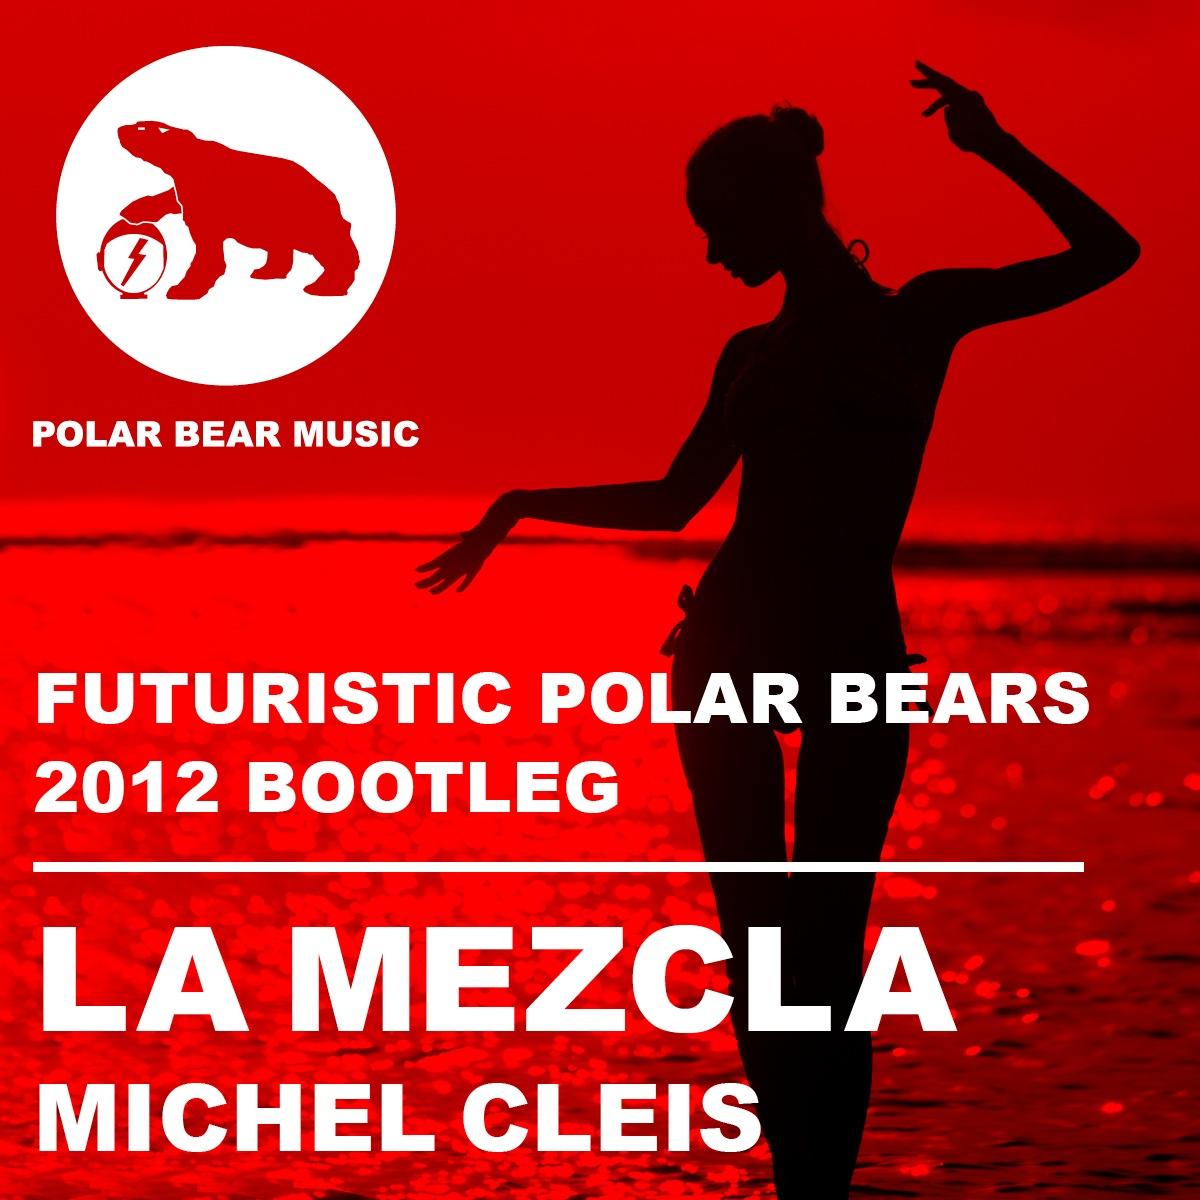 Michel Cleis - La Mezcla (Futuristic Polar Bears 2012 Bootleg)